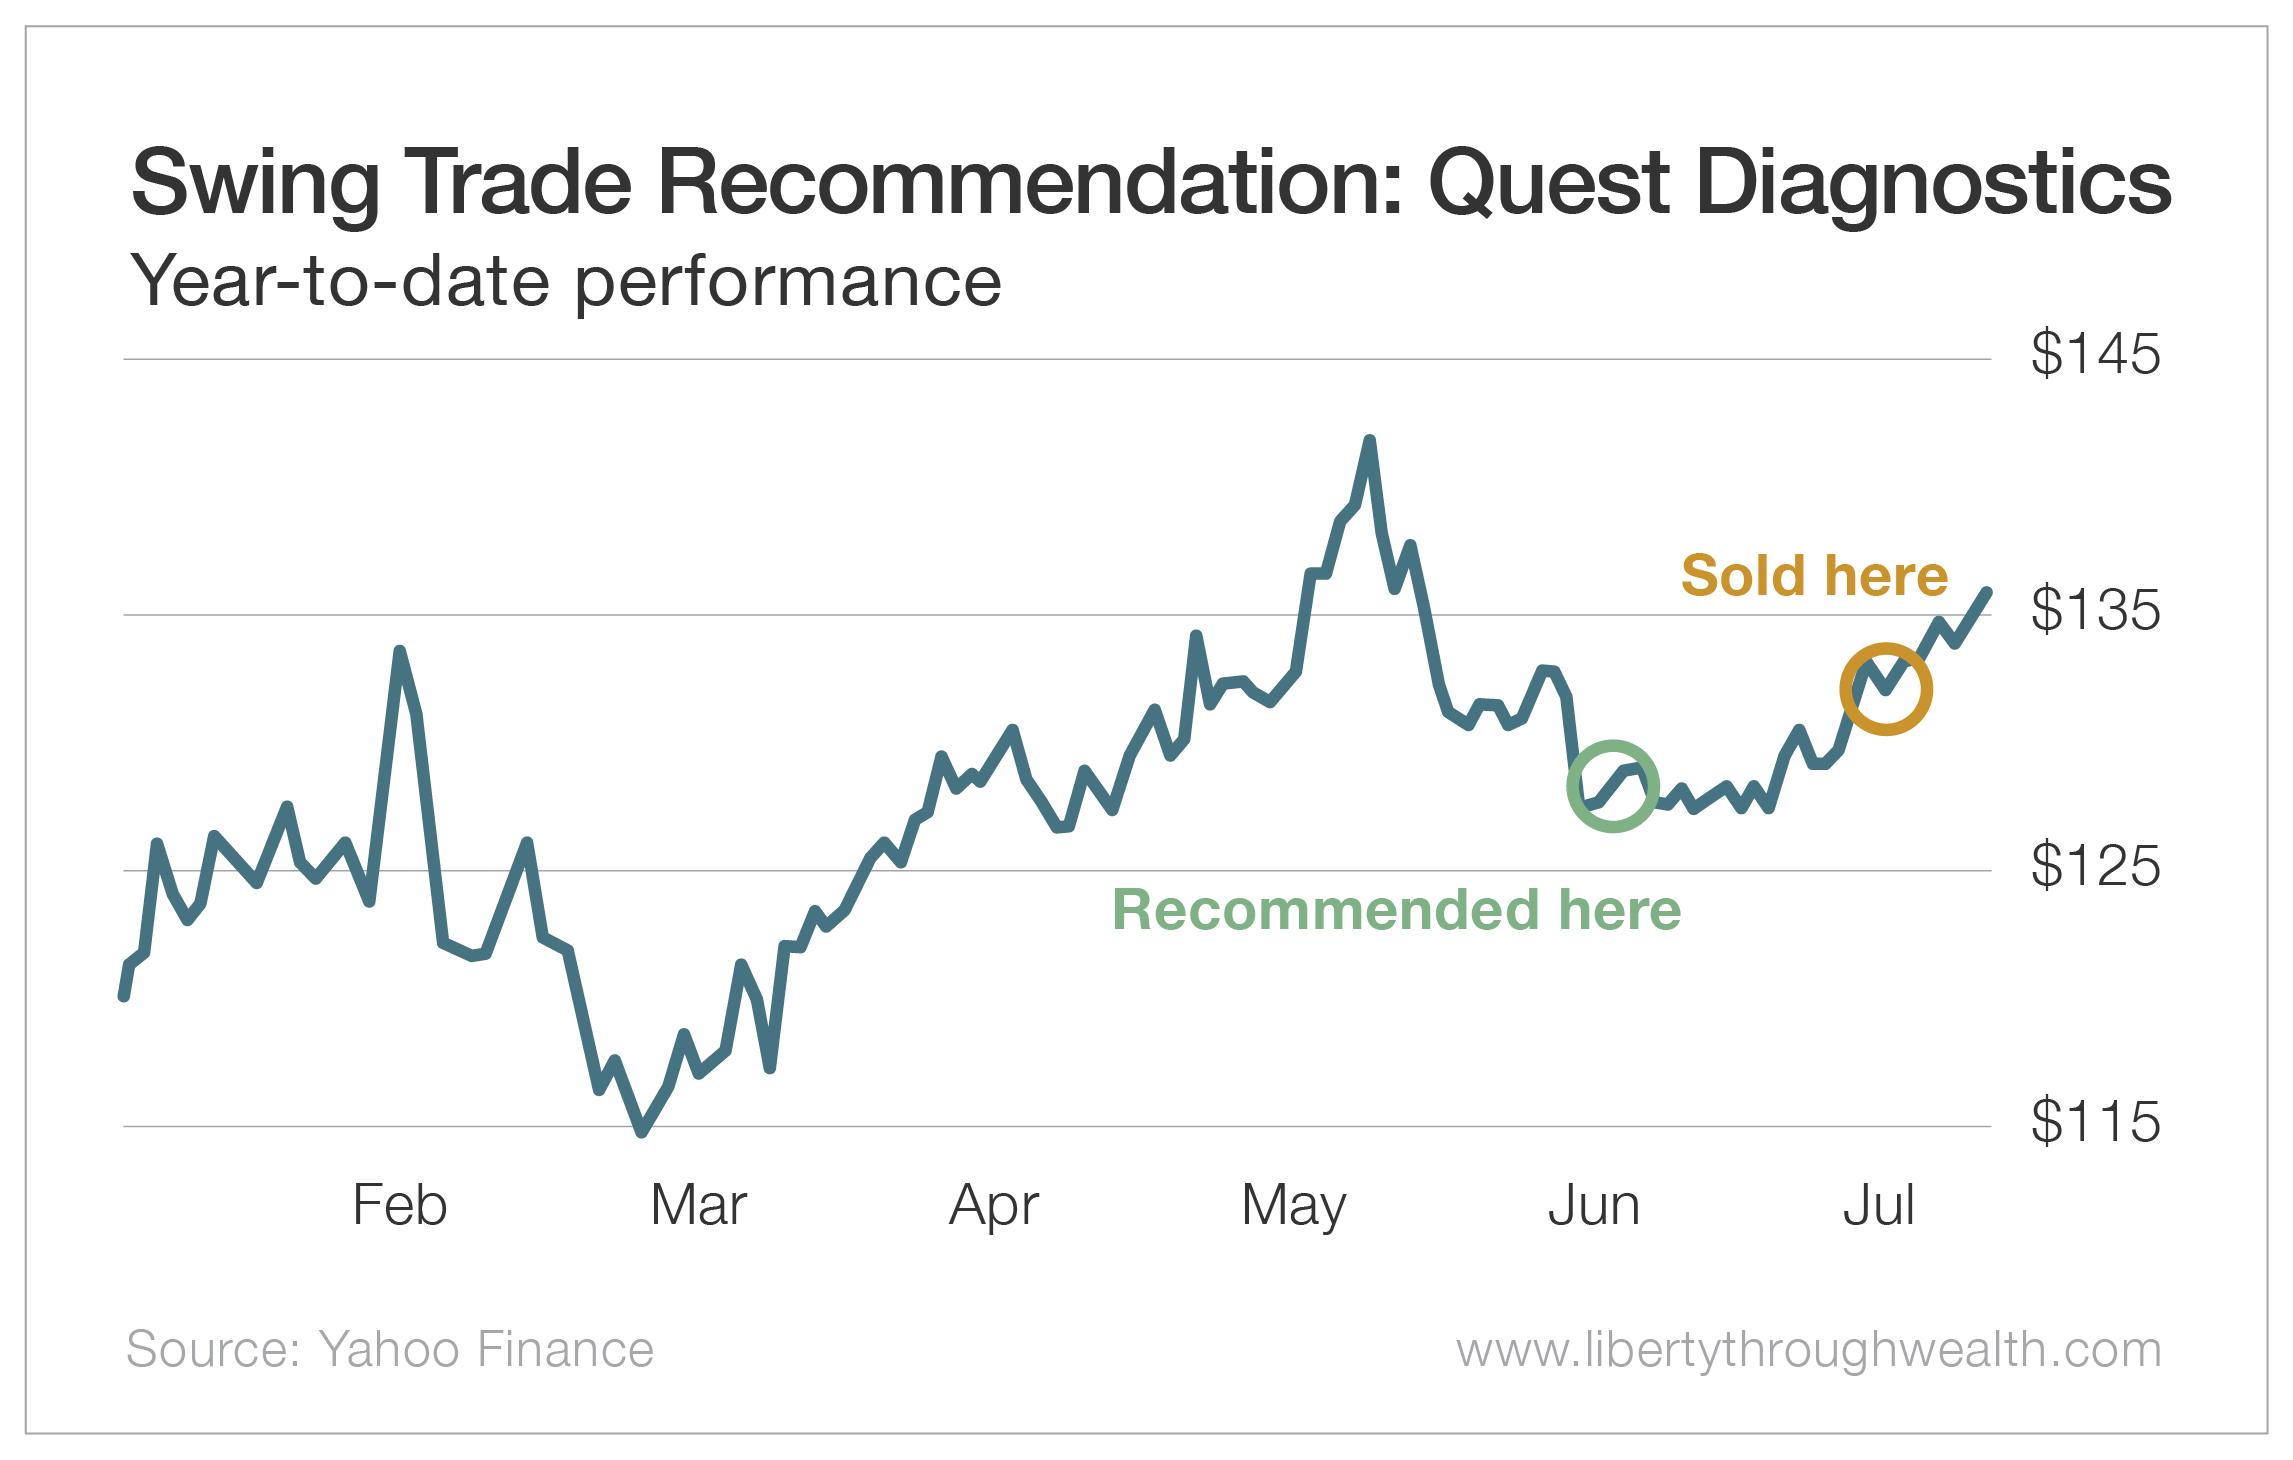 Swing Trade Recommendation: Quest Diagnostics